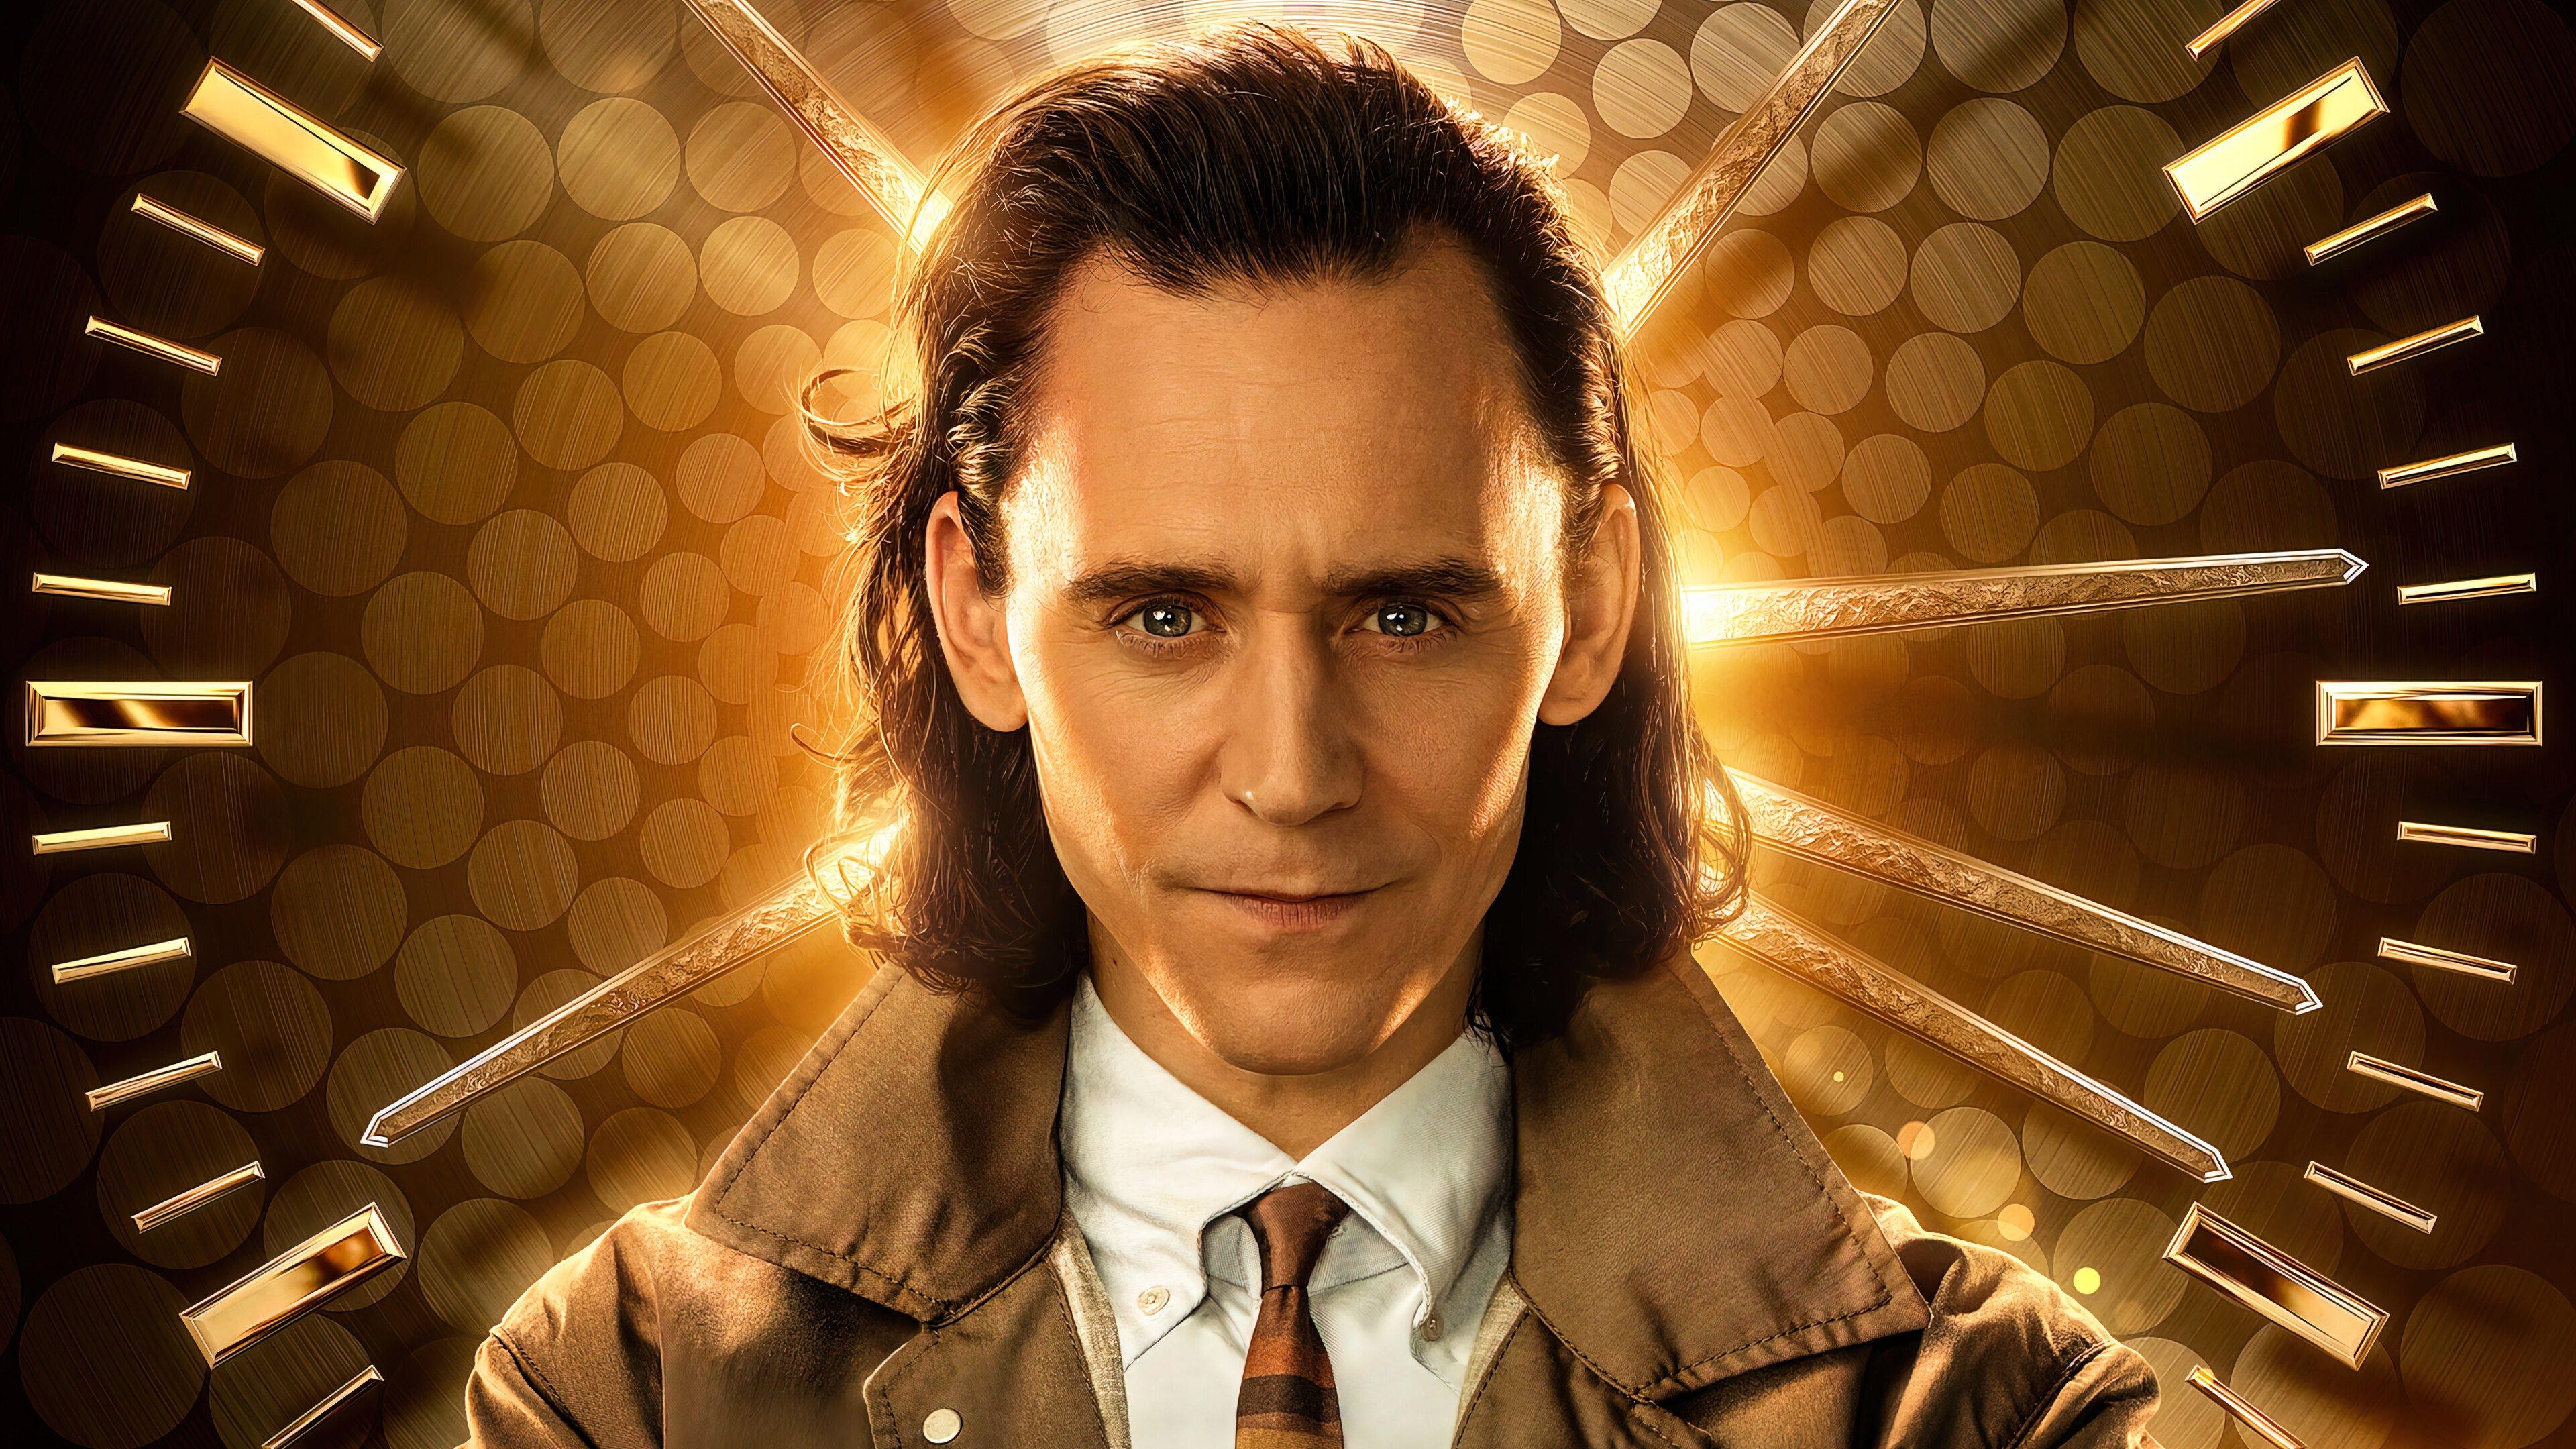 Wallpaper Loki Tom Hiddleston Loki Series